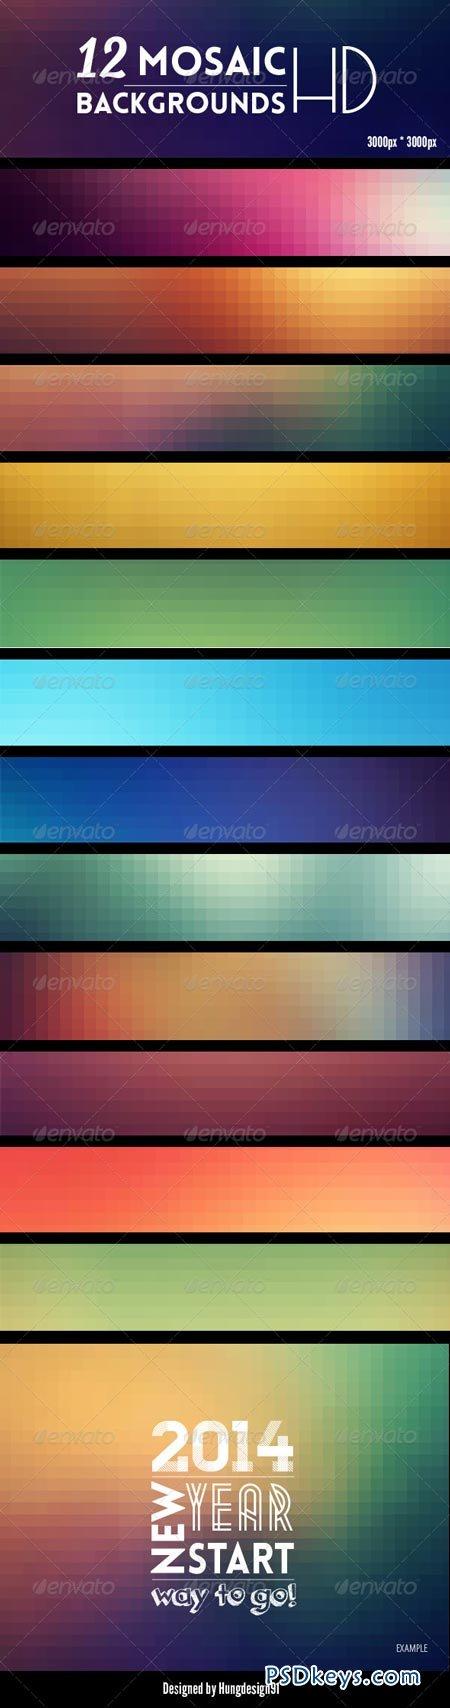 12 Mosaic Backgrounds HD 6865992